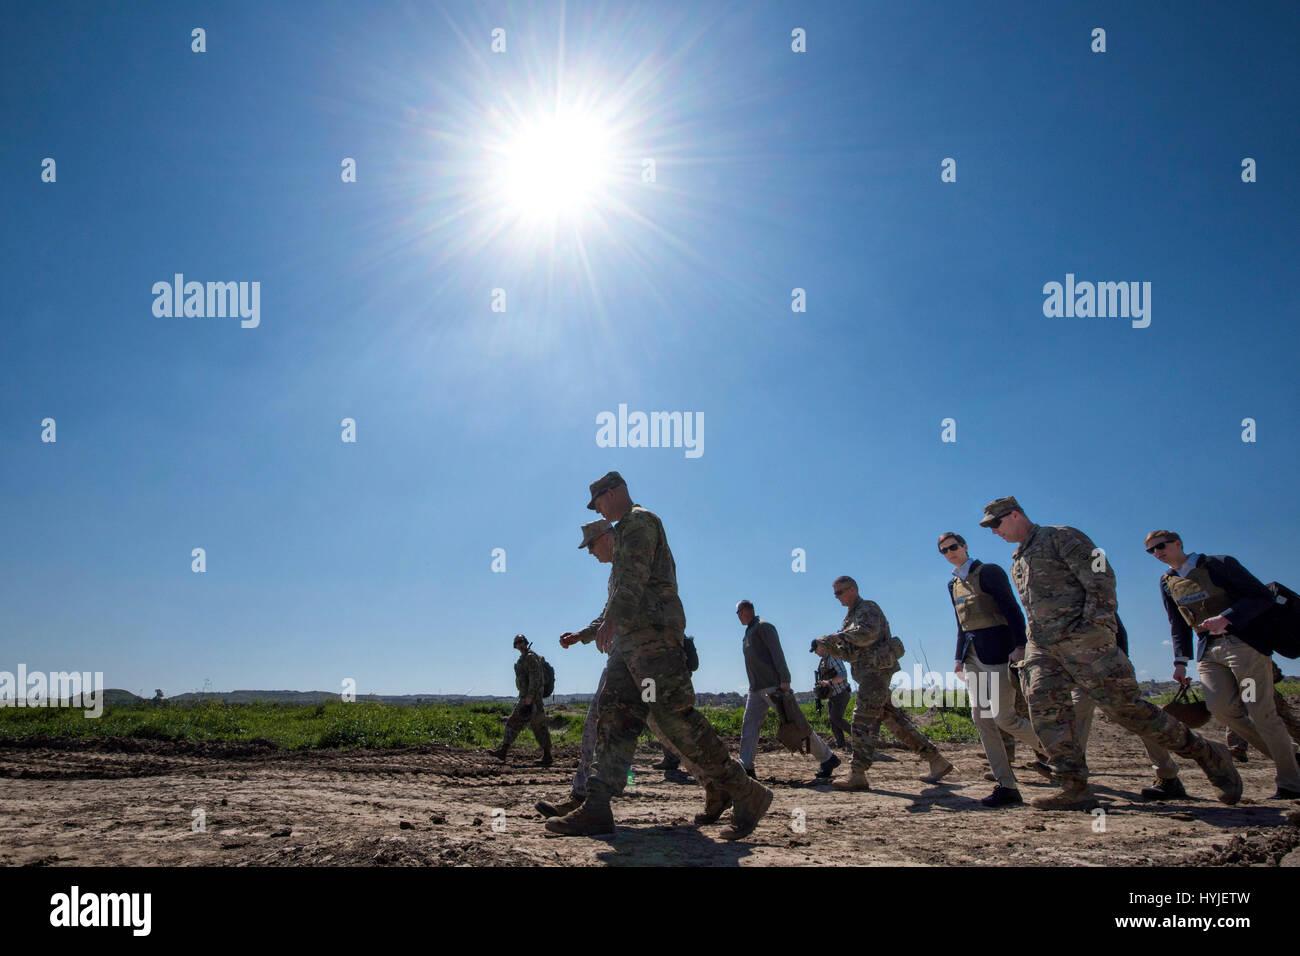 Qayyarah West, Iraq. 04th Apr, 2017. U.S. Joint Chiefs Chairman Gen. Joseph Dunford, center, and Jared Kushner, - Stock Image